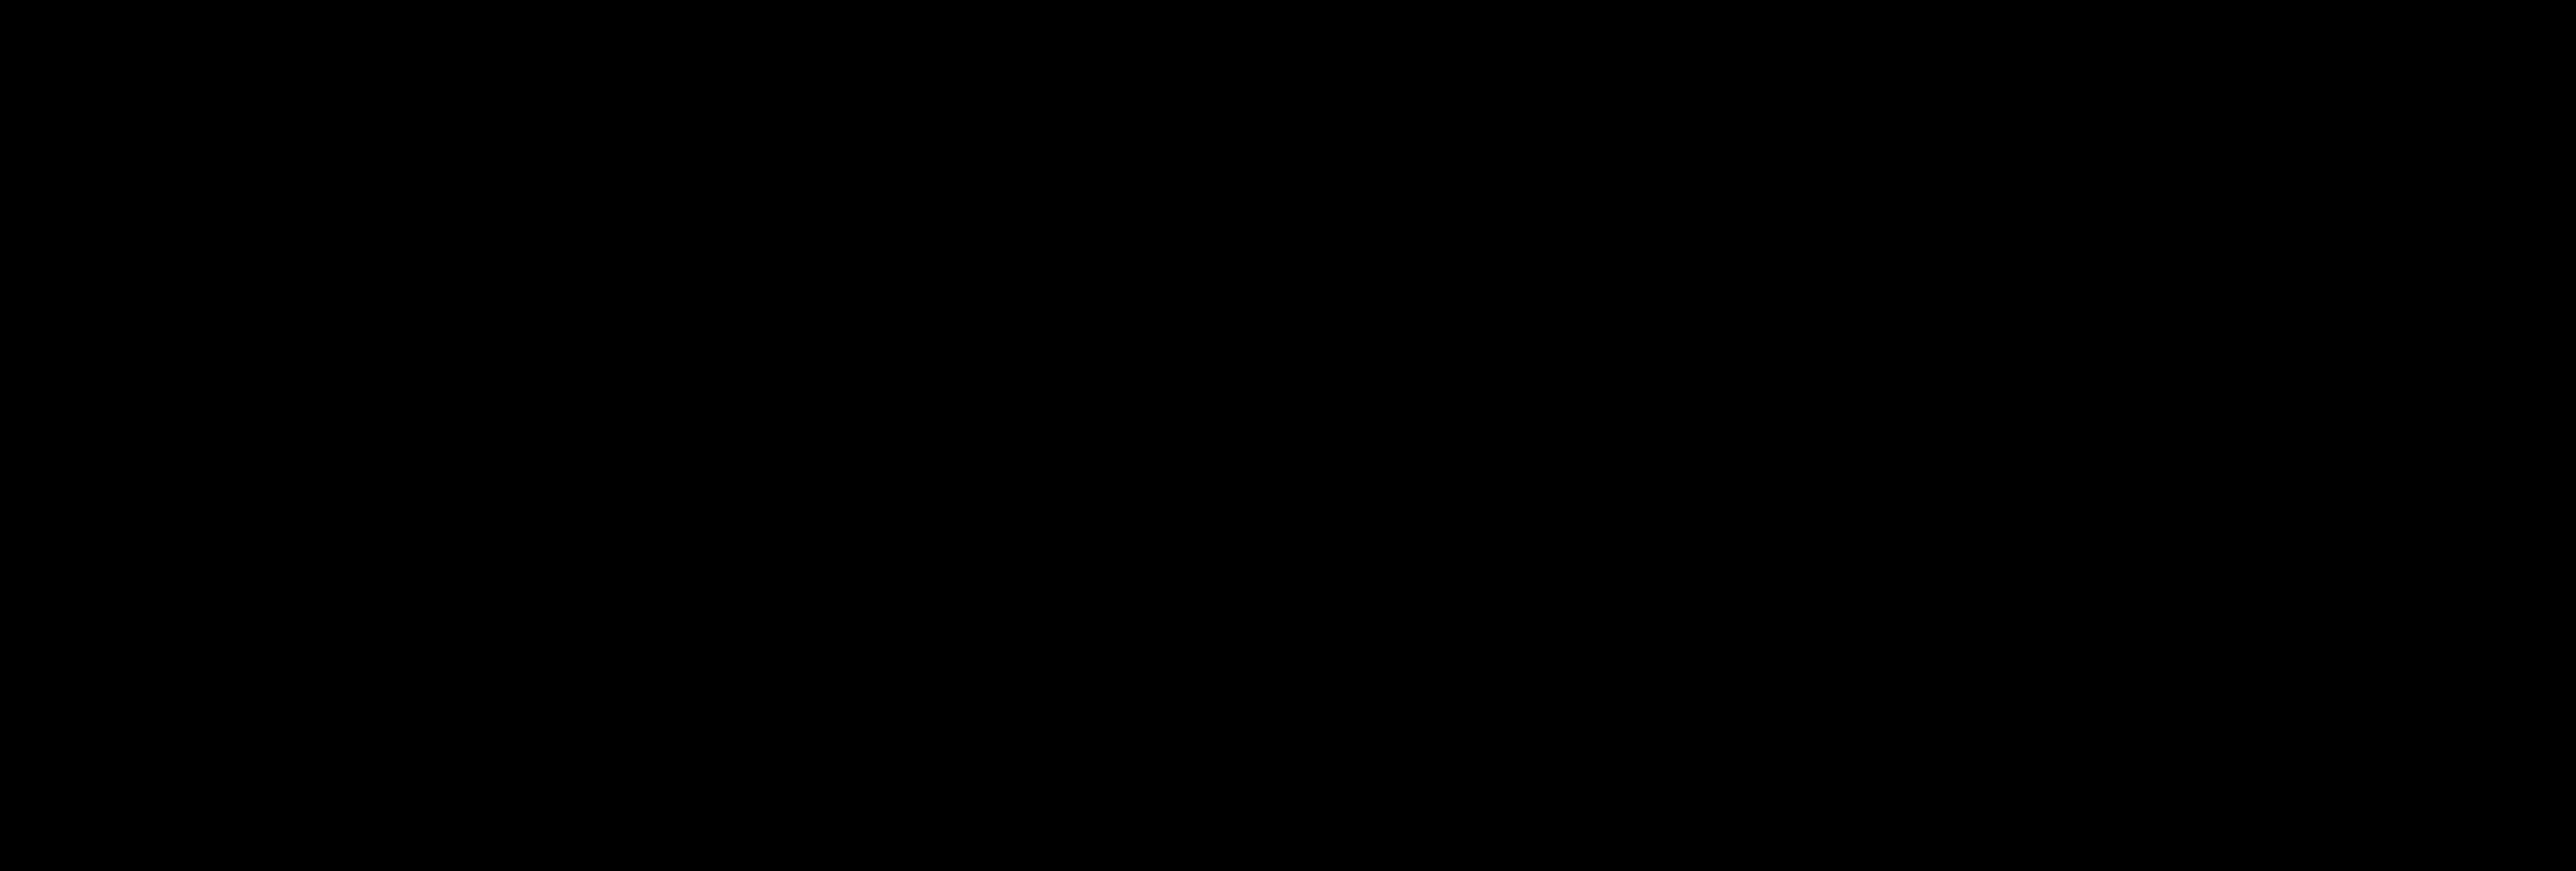 2-[N<sub>2</sub>-(4-Azido-2,3,5,6-tetrafluorobenzoyl)-N<sub>6</sub>-(6 -biotinamidocaproyl)-L-lysinyl]ethyl 2-Carboxyethyl Disulfide